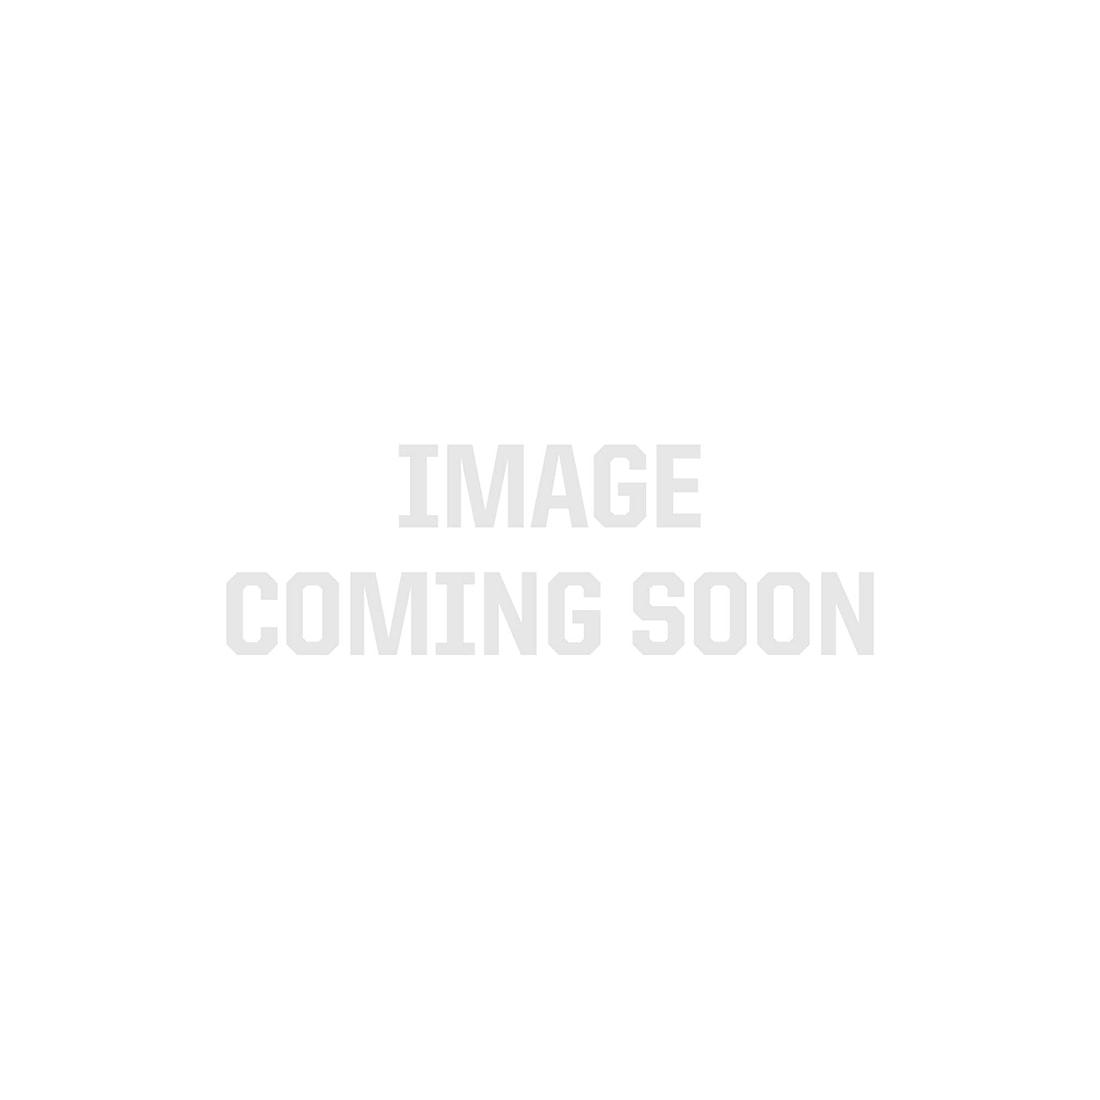 HyperFlex 2835 LED Strip Light - Blue - 60/m - CurrentControl - Sample Kit